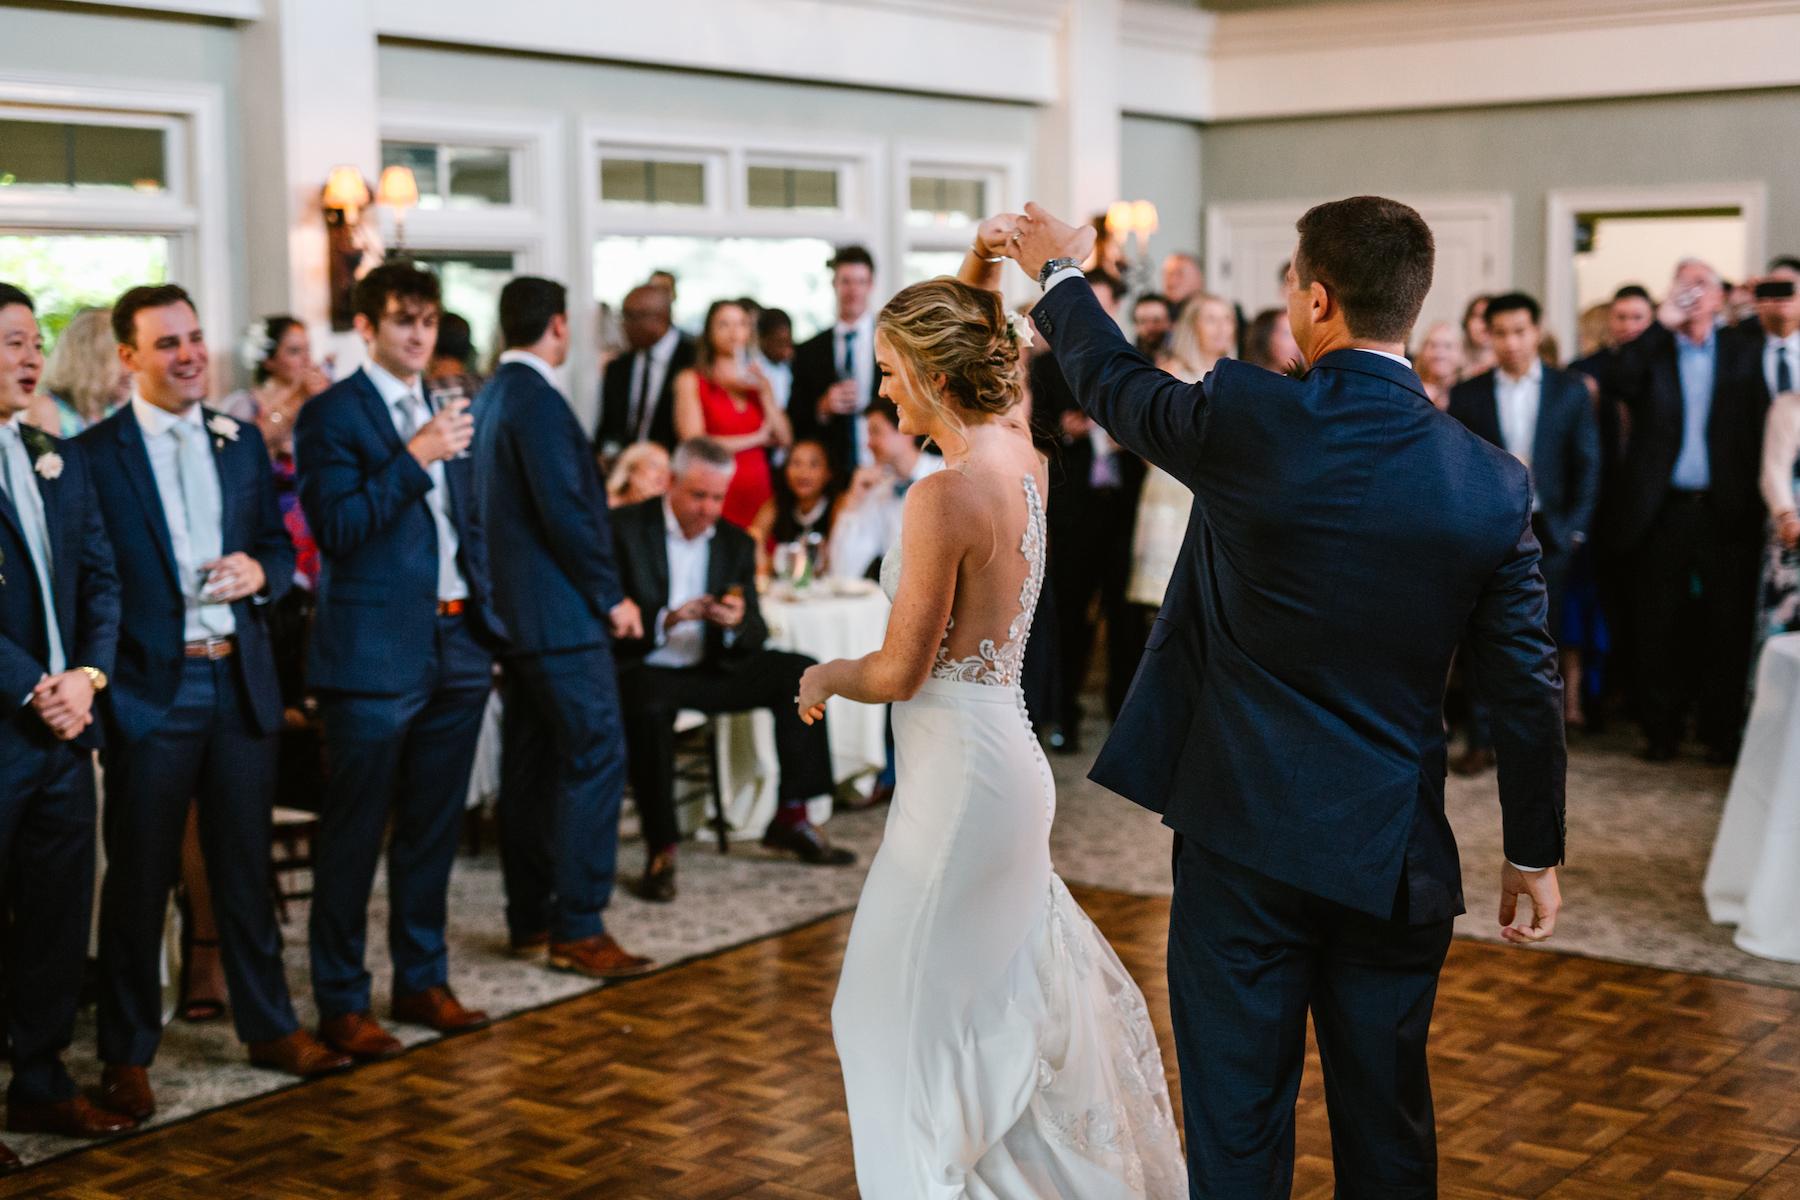 wedding-engagement-photographer-spartanburg-greenville-columbia-carolina-south-north-514.JPG